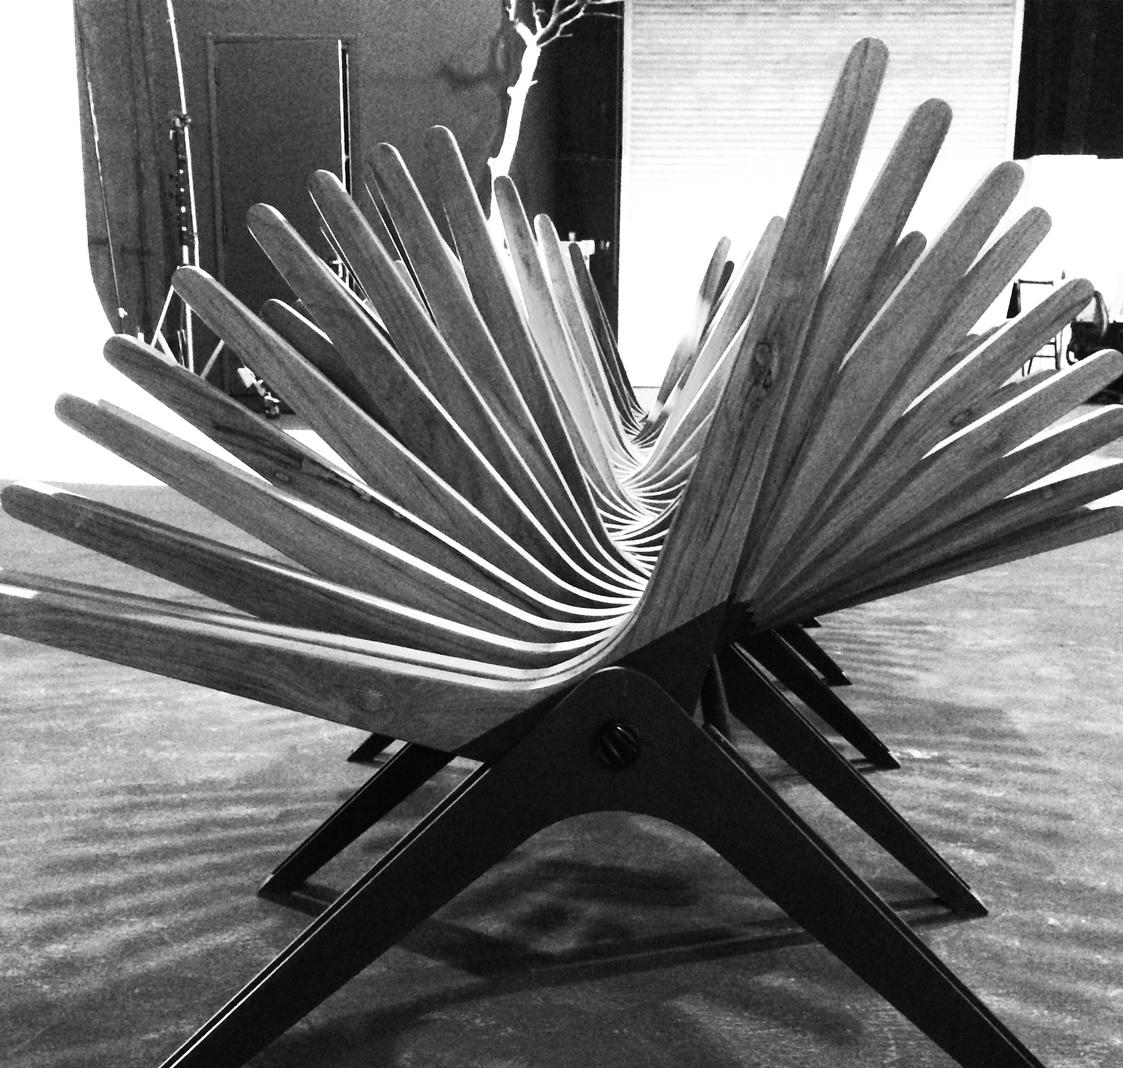 Anna Szonyi's Boomerang Bench, winner of the Urban Commissions design contest.